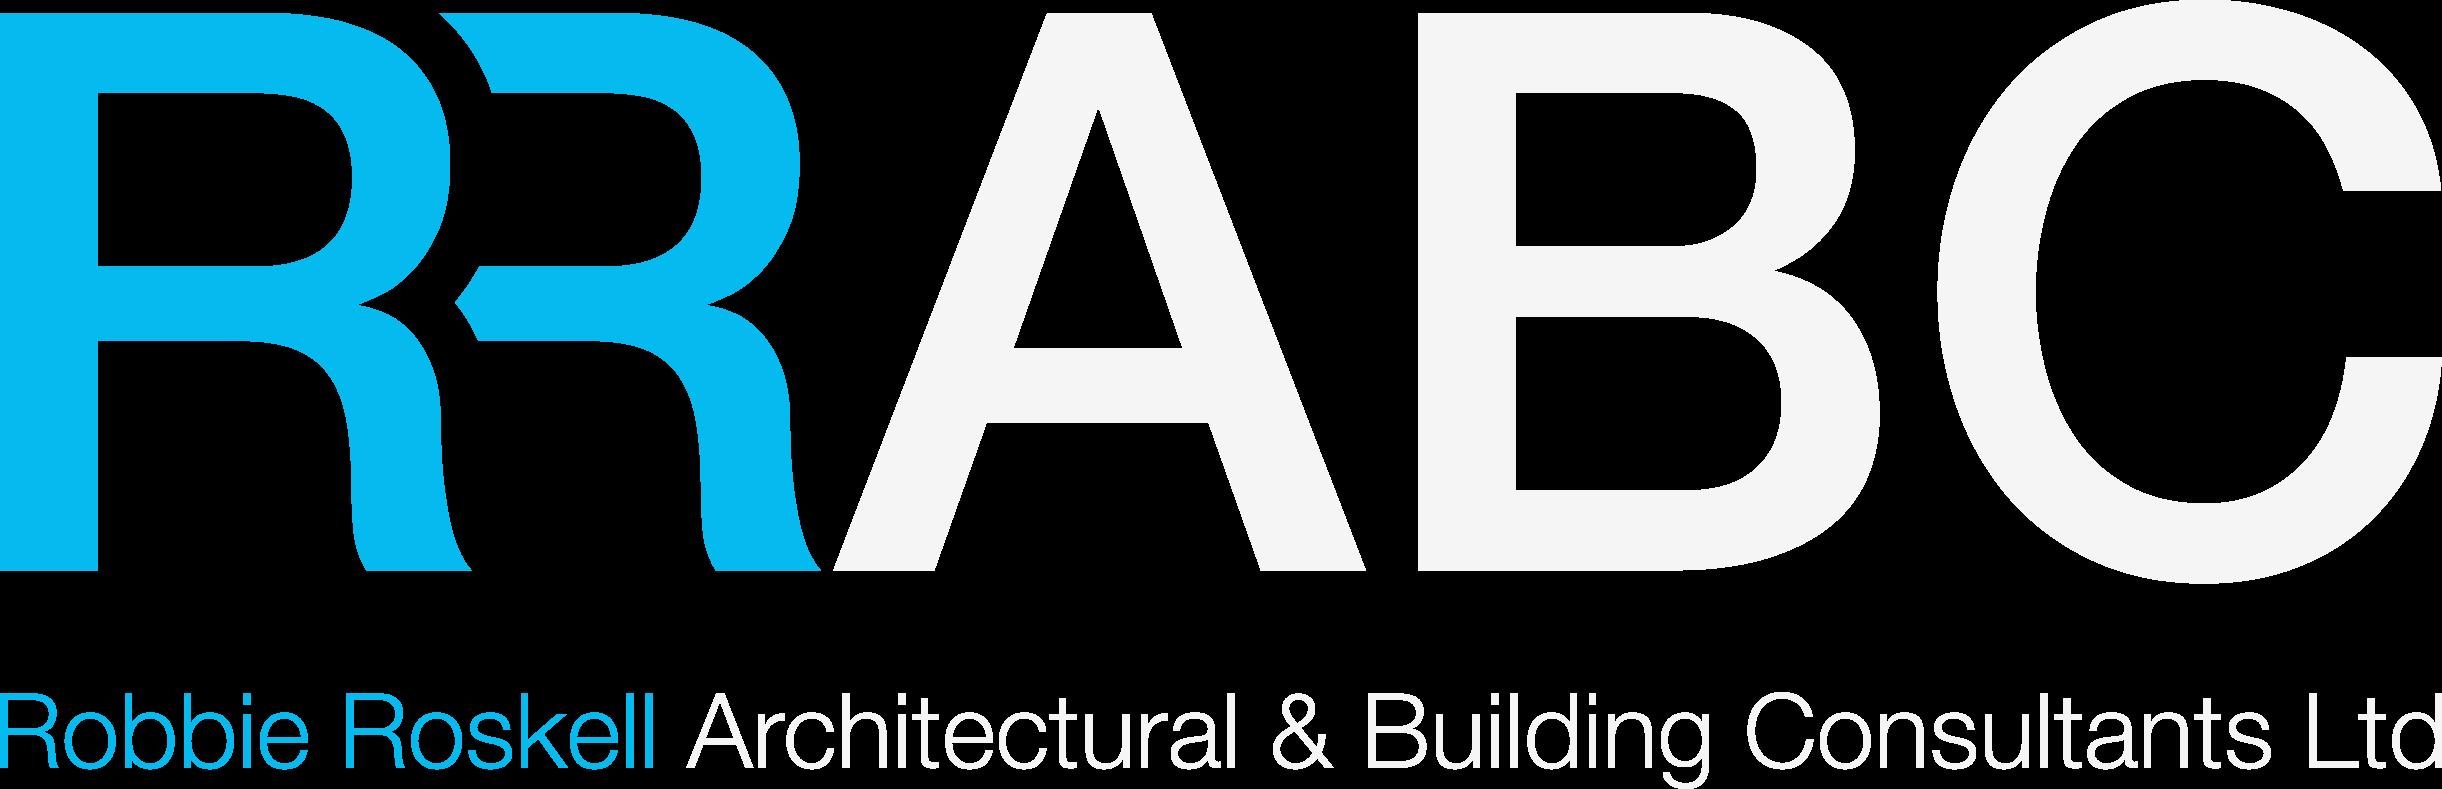 RRABC_Robbie_Logo_Invert